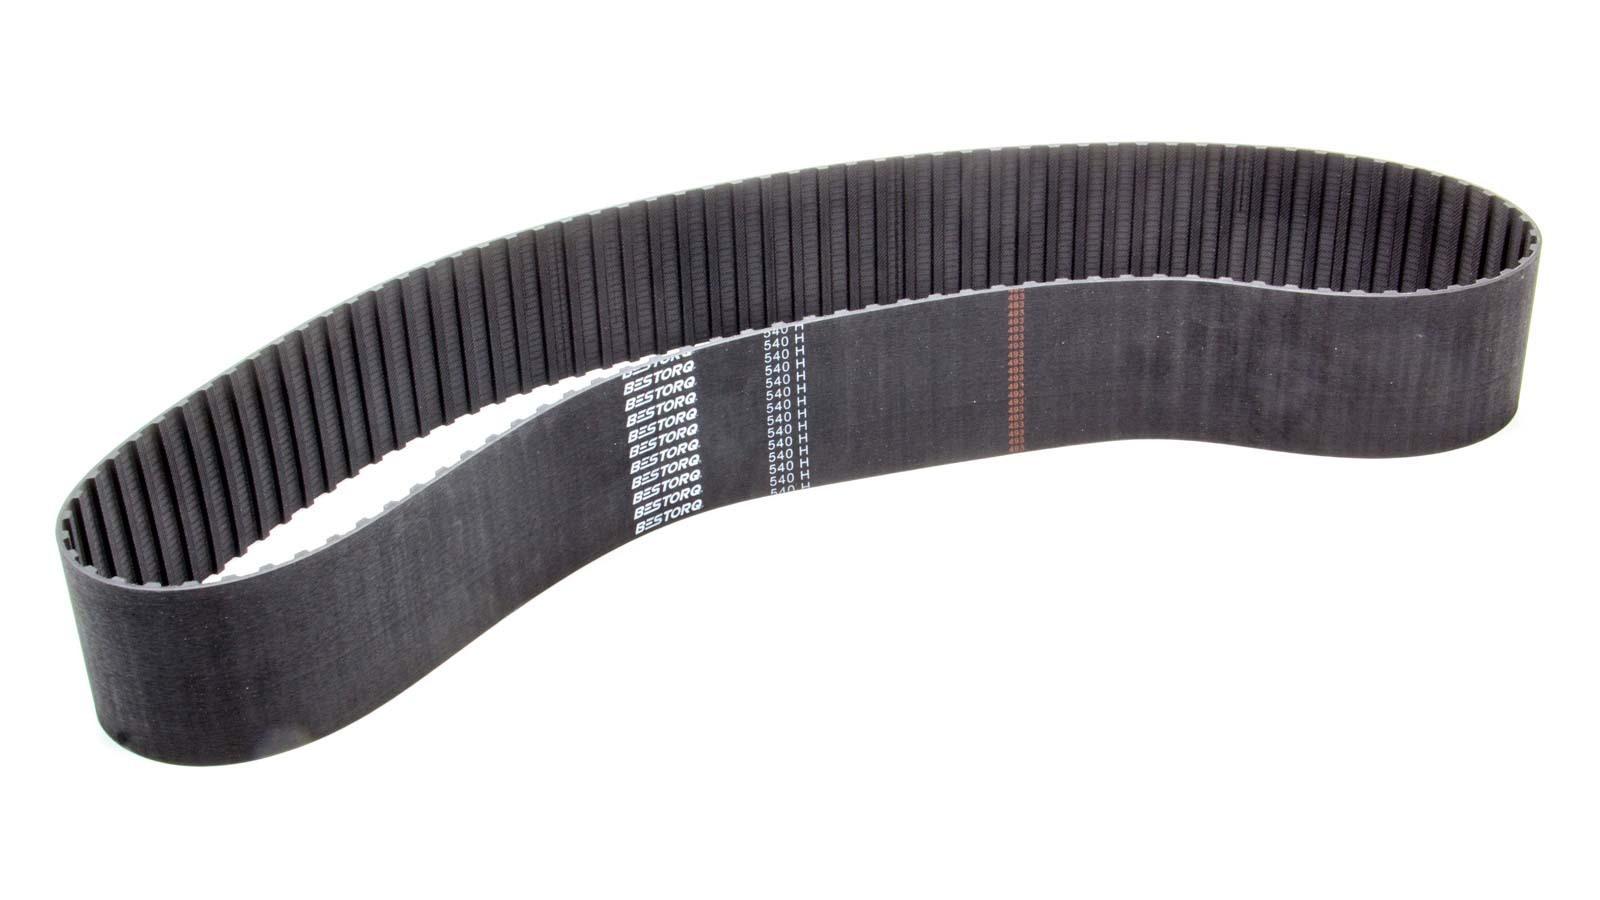 Blower Drive Service Blower Belt - 120T 60 x 3 - 1/2 Pitch